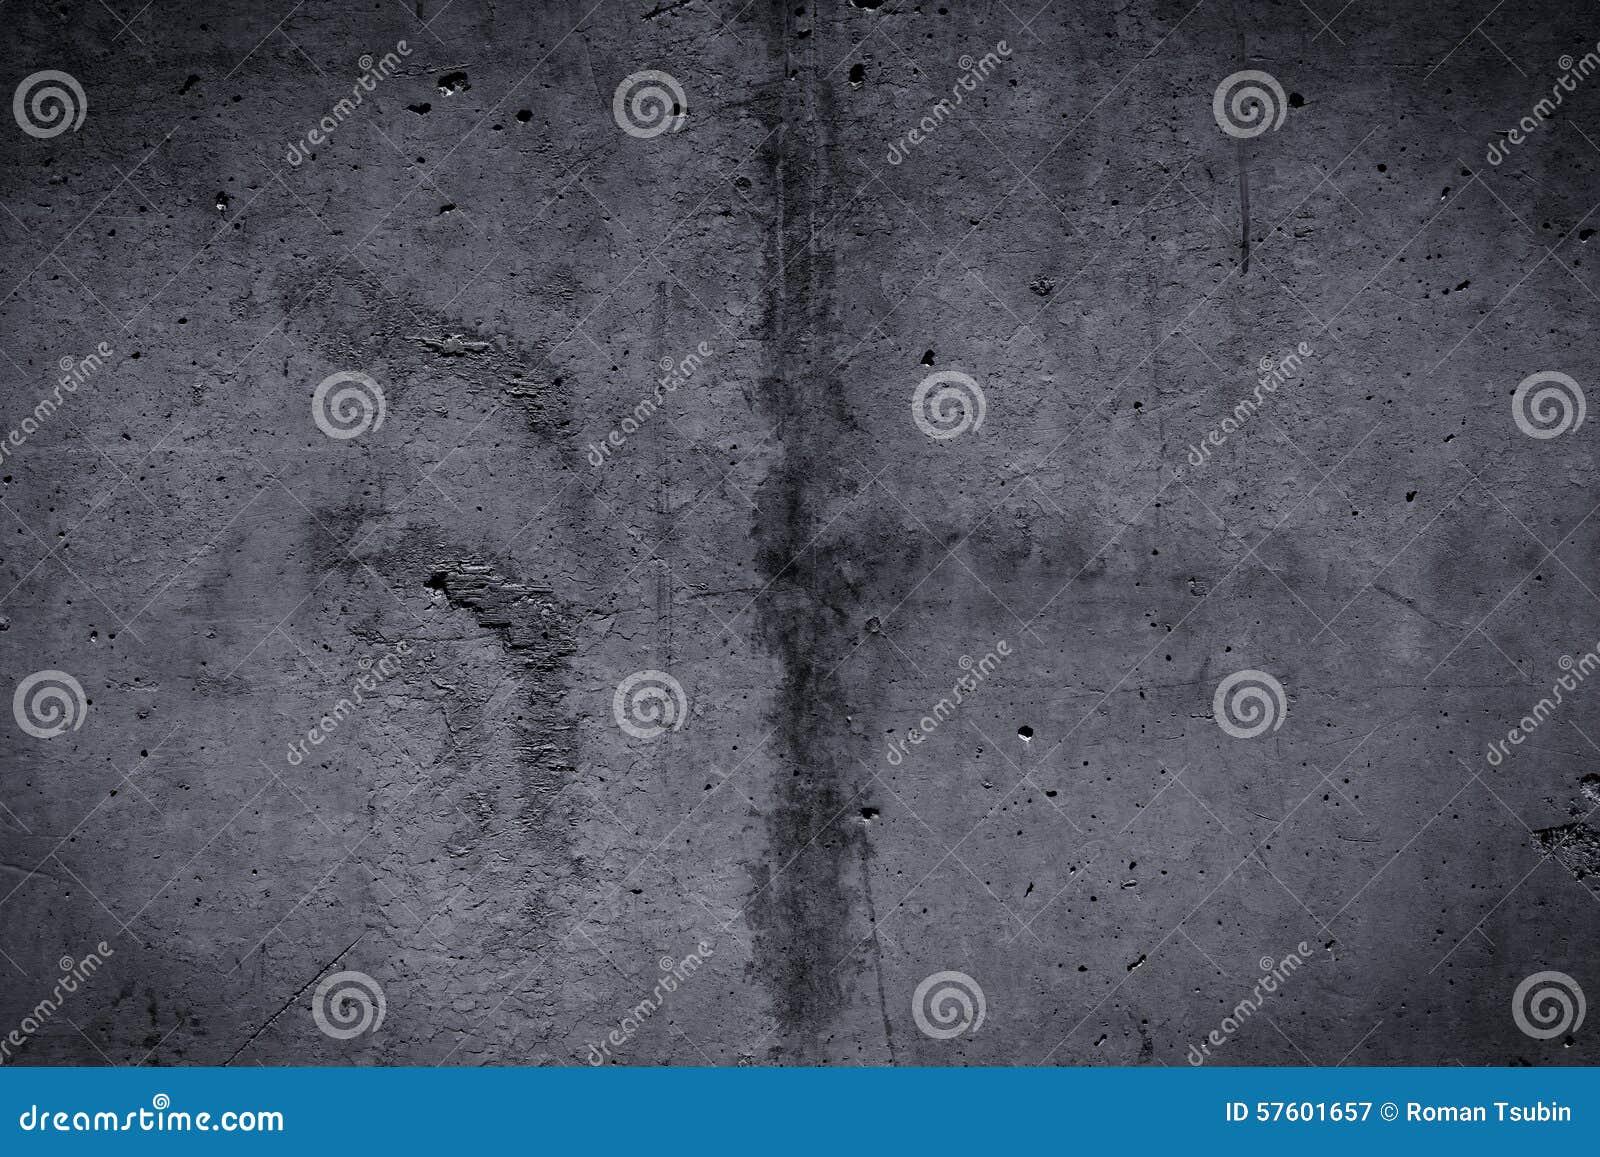 smooth concrete background - photo #29